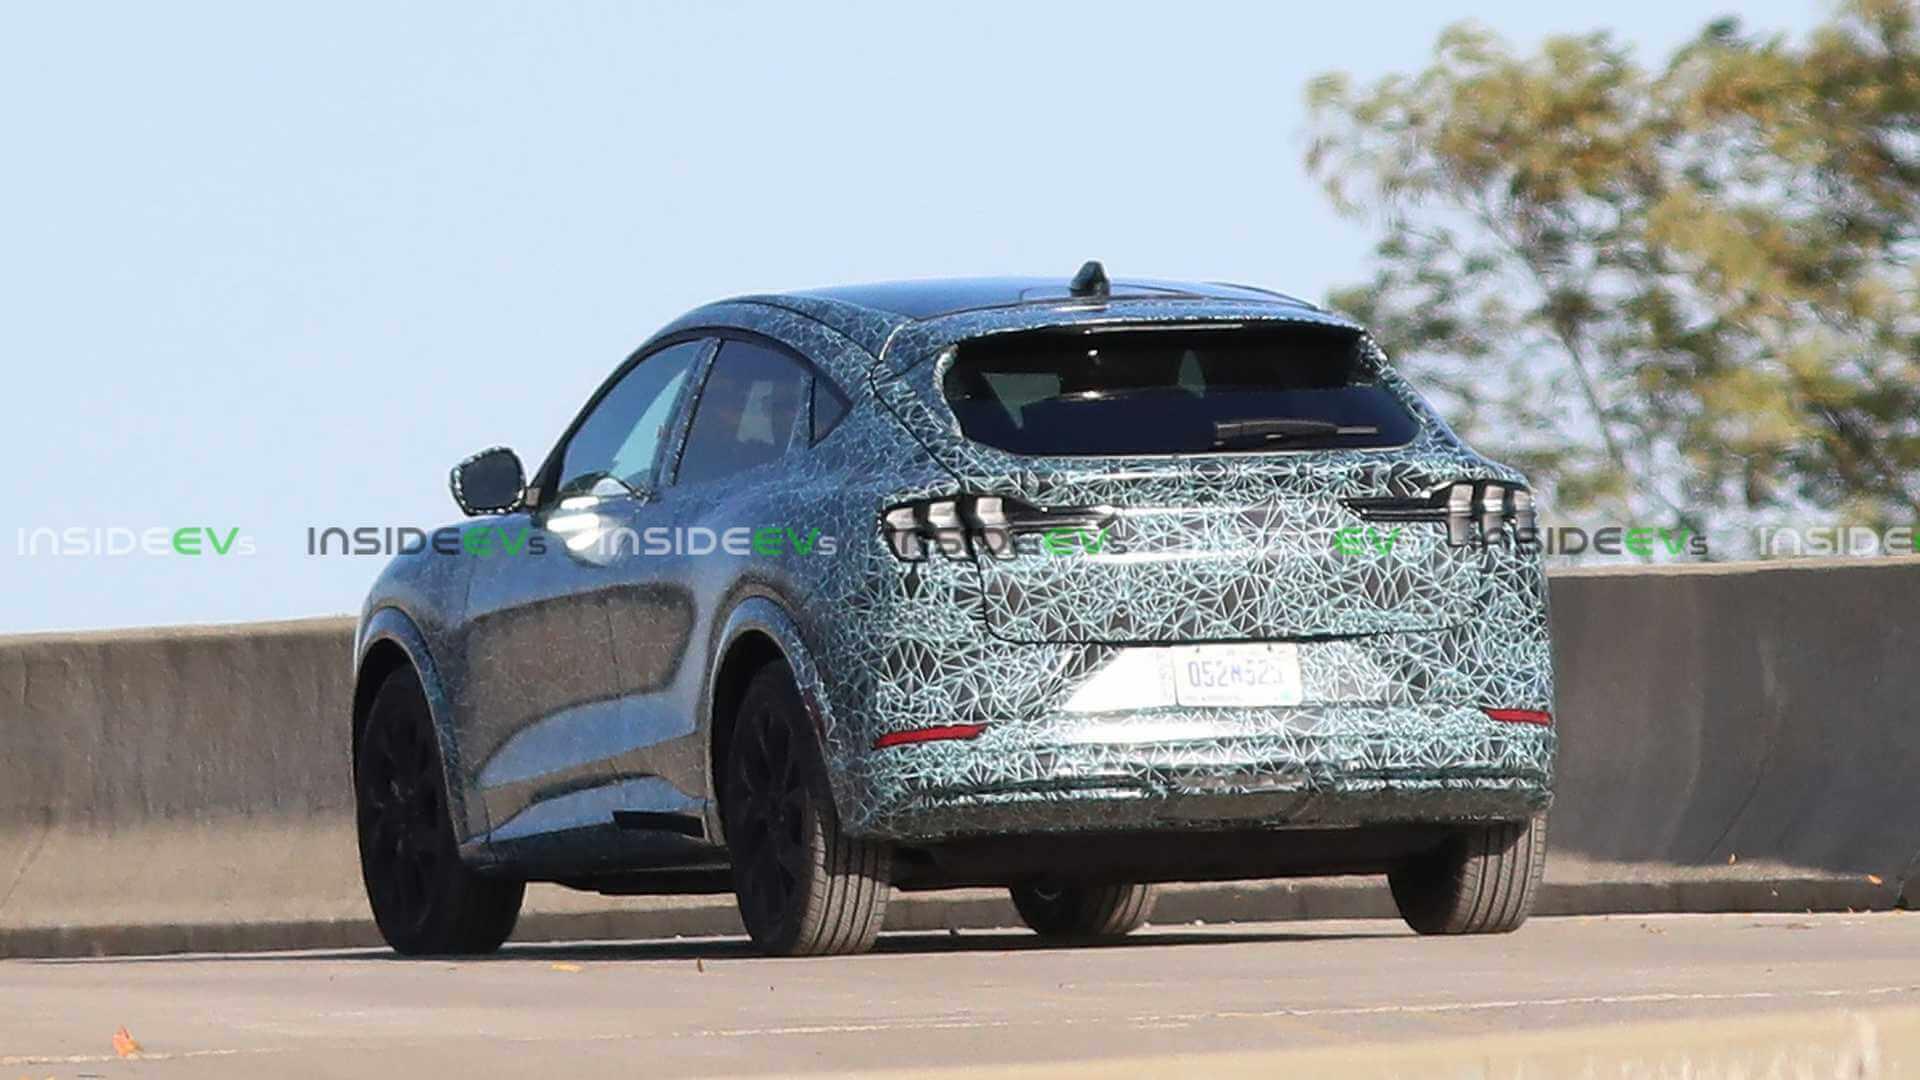 Шпионские фото электрического Ford демонстрируют родство с Mustang